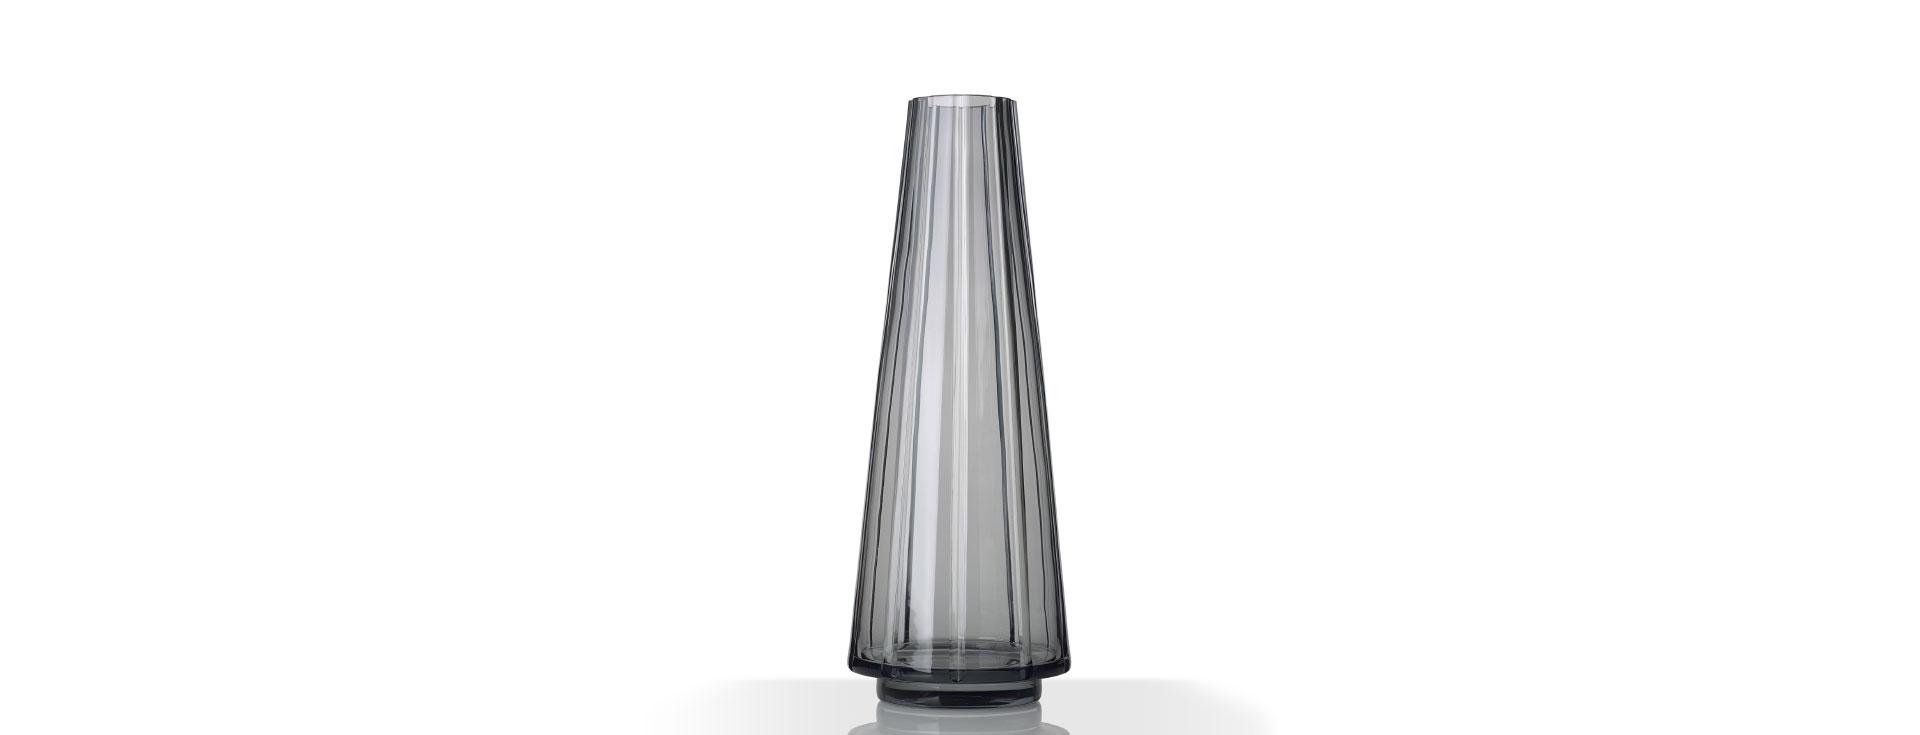 Vase taillé GM Studio Marianne Guedin